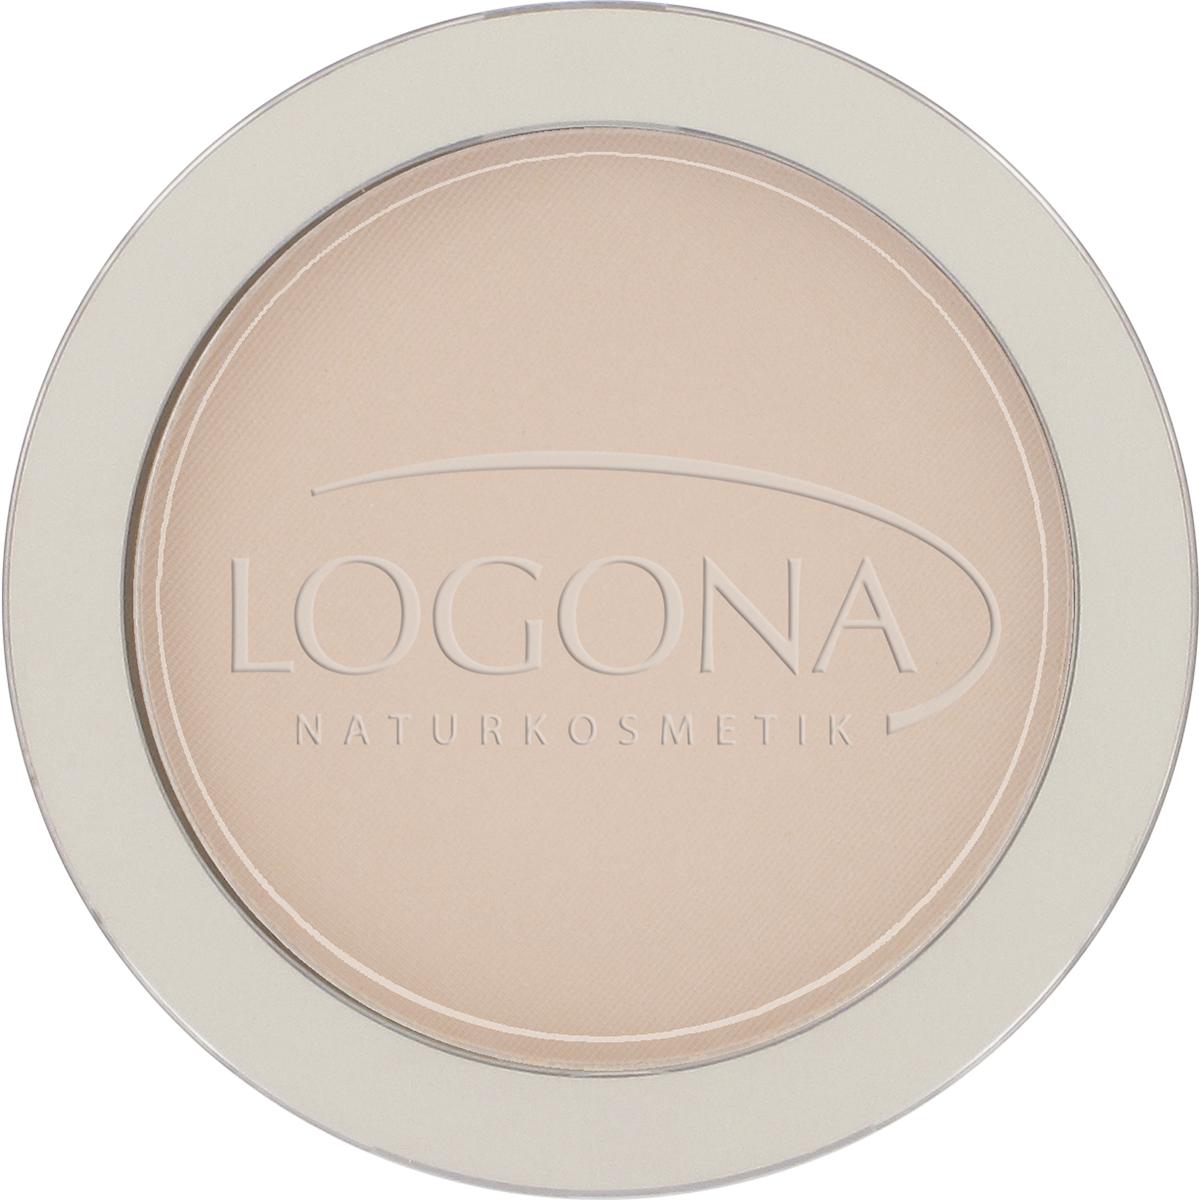 face powder no 02 medium beige logona naturkosmetik. Black Bedroom Furniture Sets. Home Design Ideas